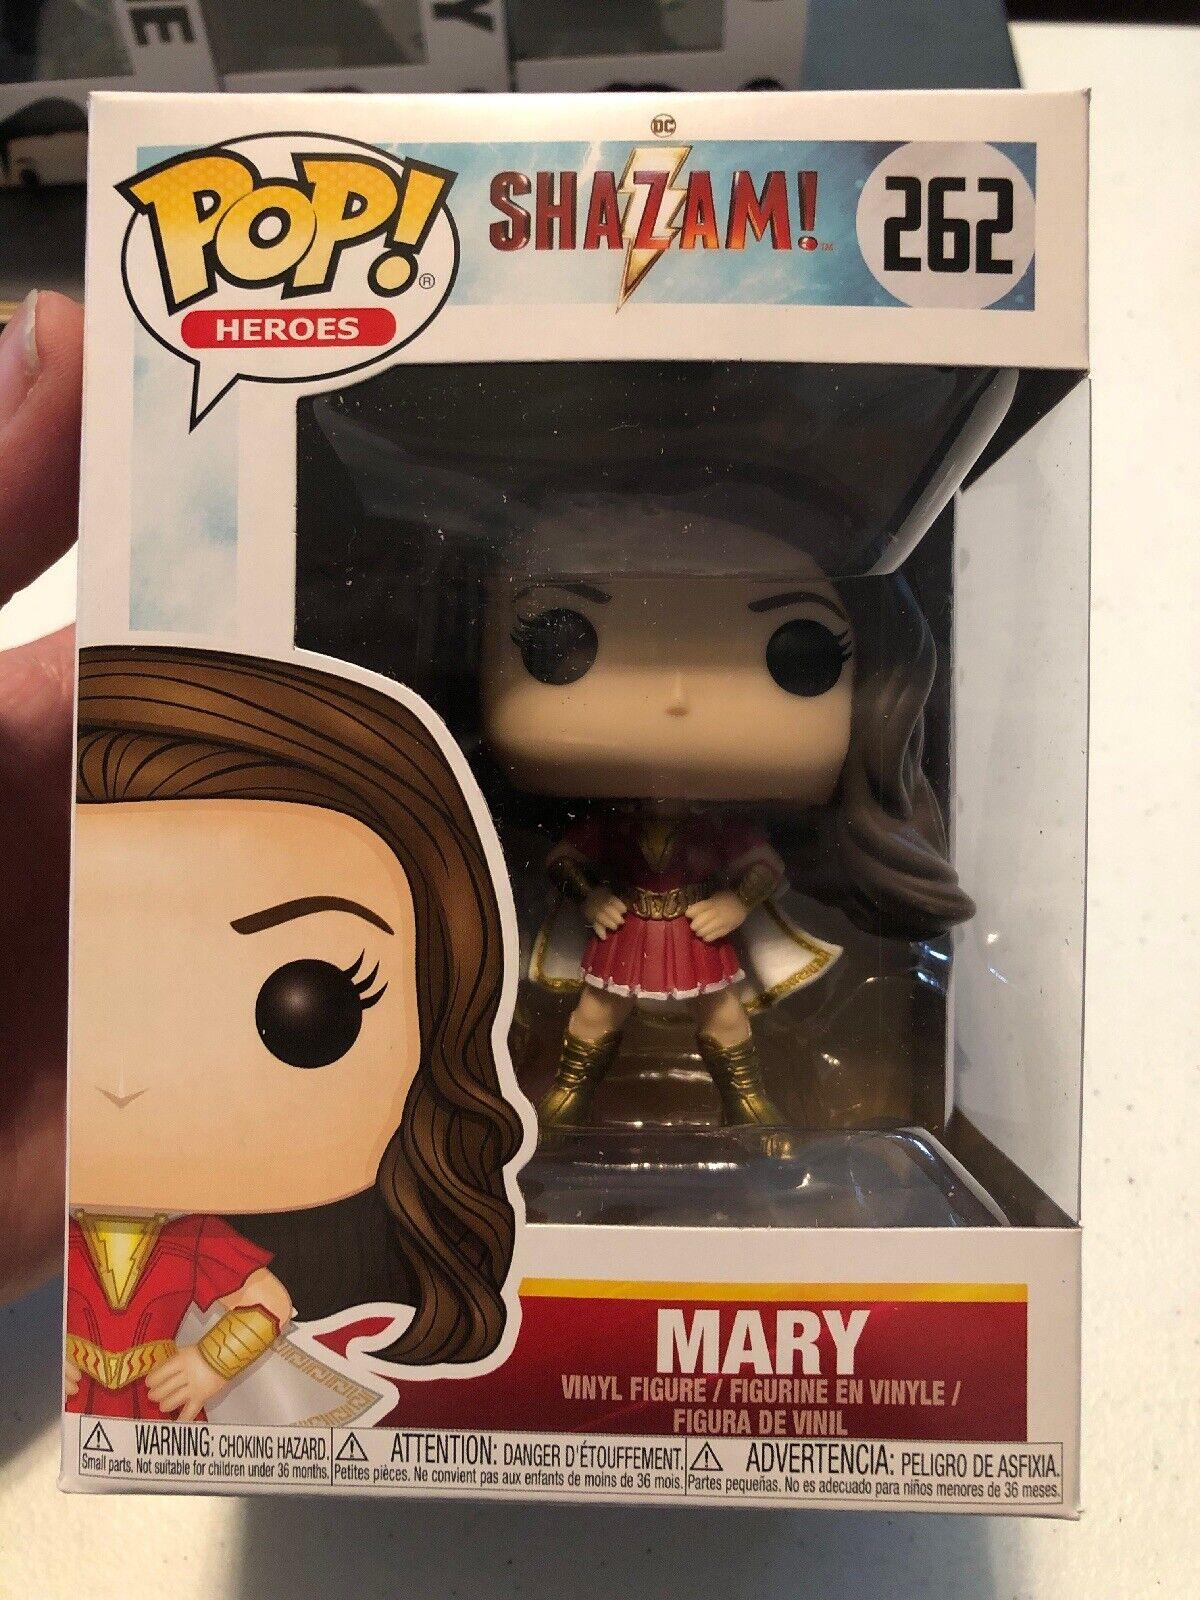 Shazam! Mary Vinyl Figure Item #36810 Funko Pop Heroes